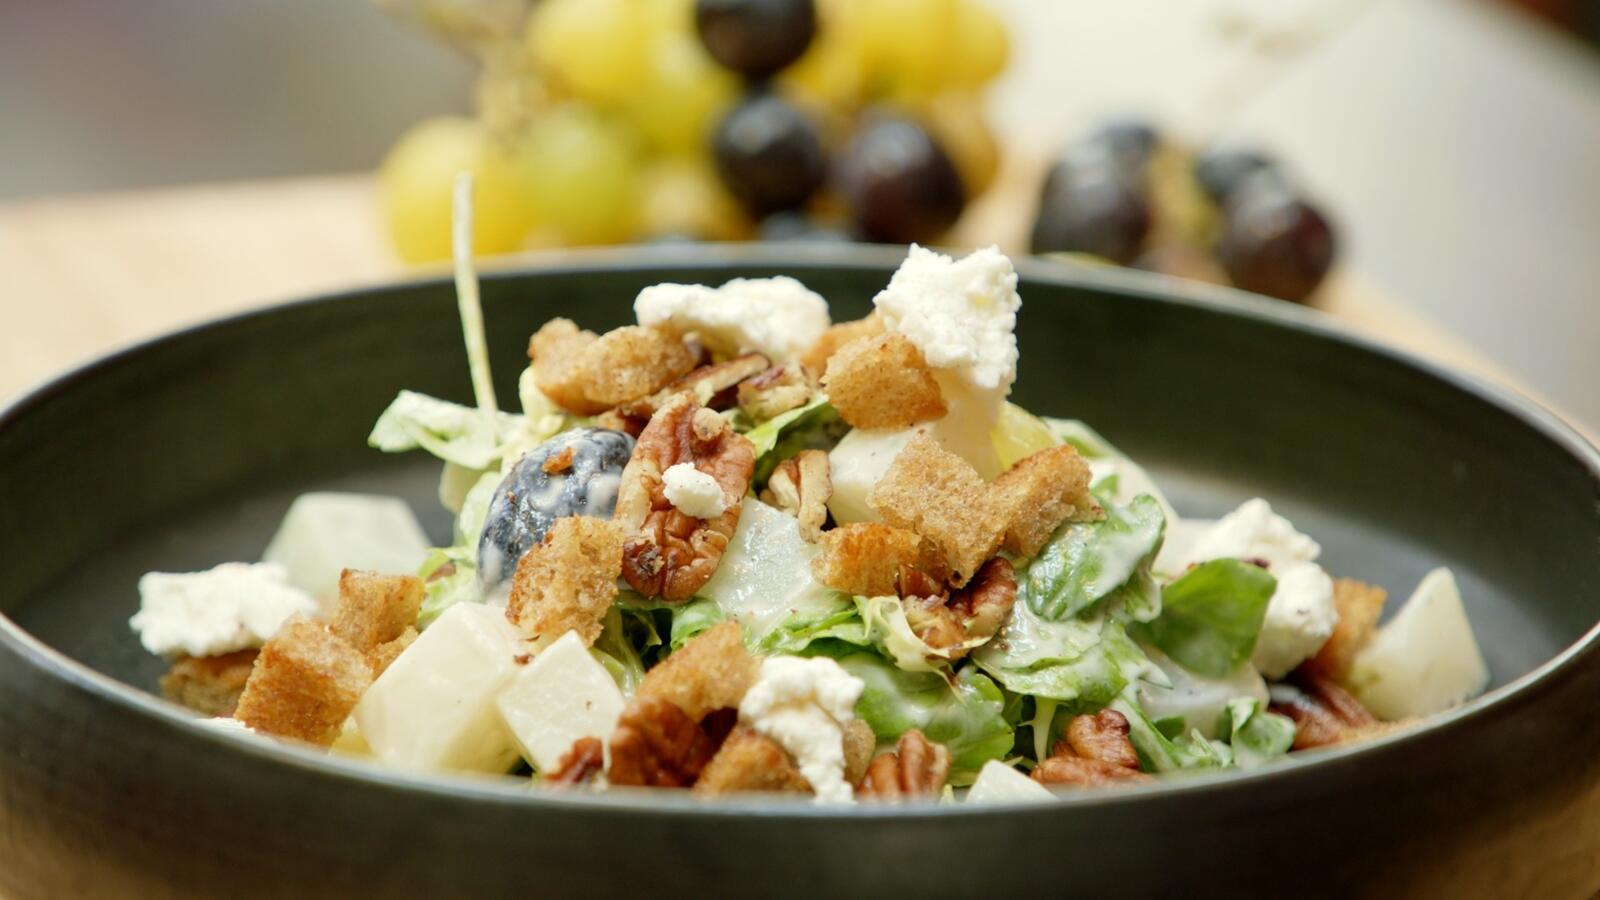 Salade met koolrabi en druiven en vinaigrette van geitenkaas